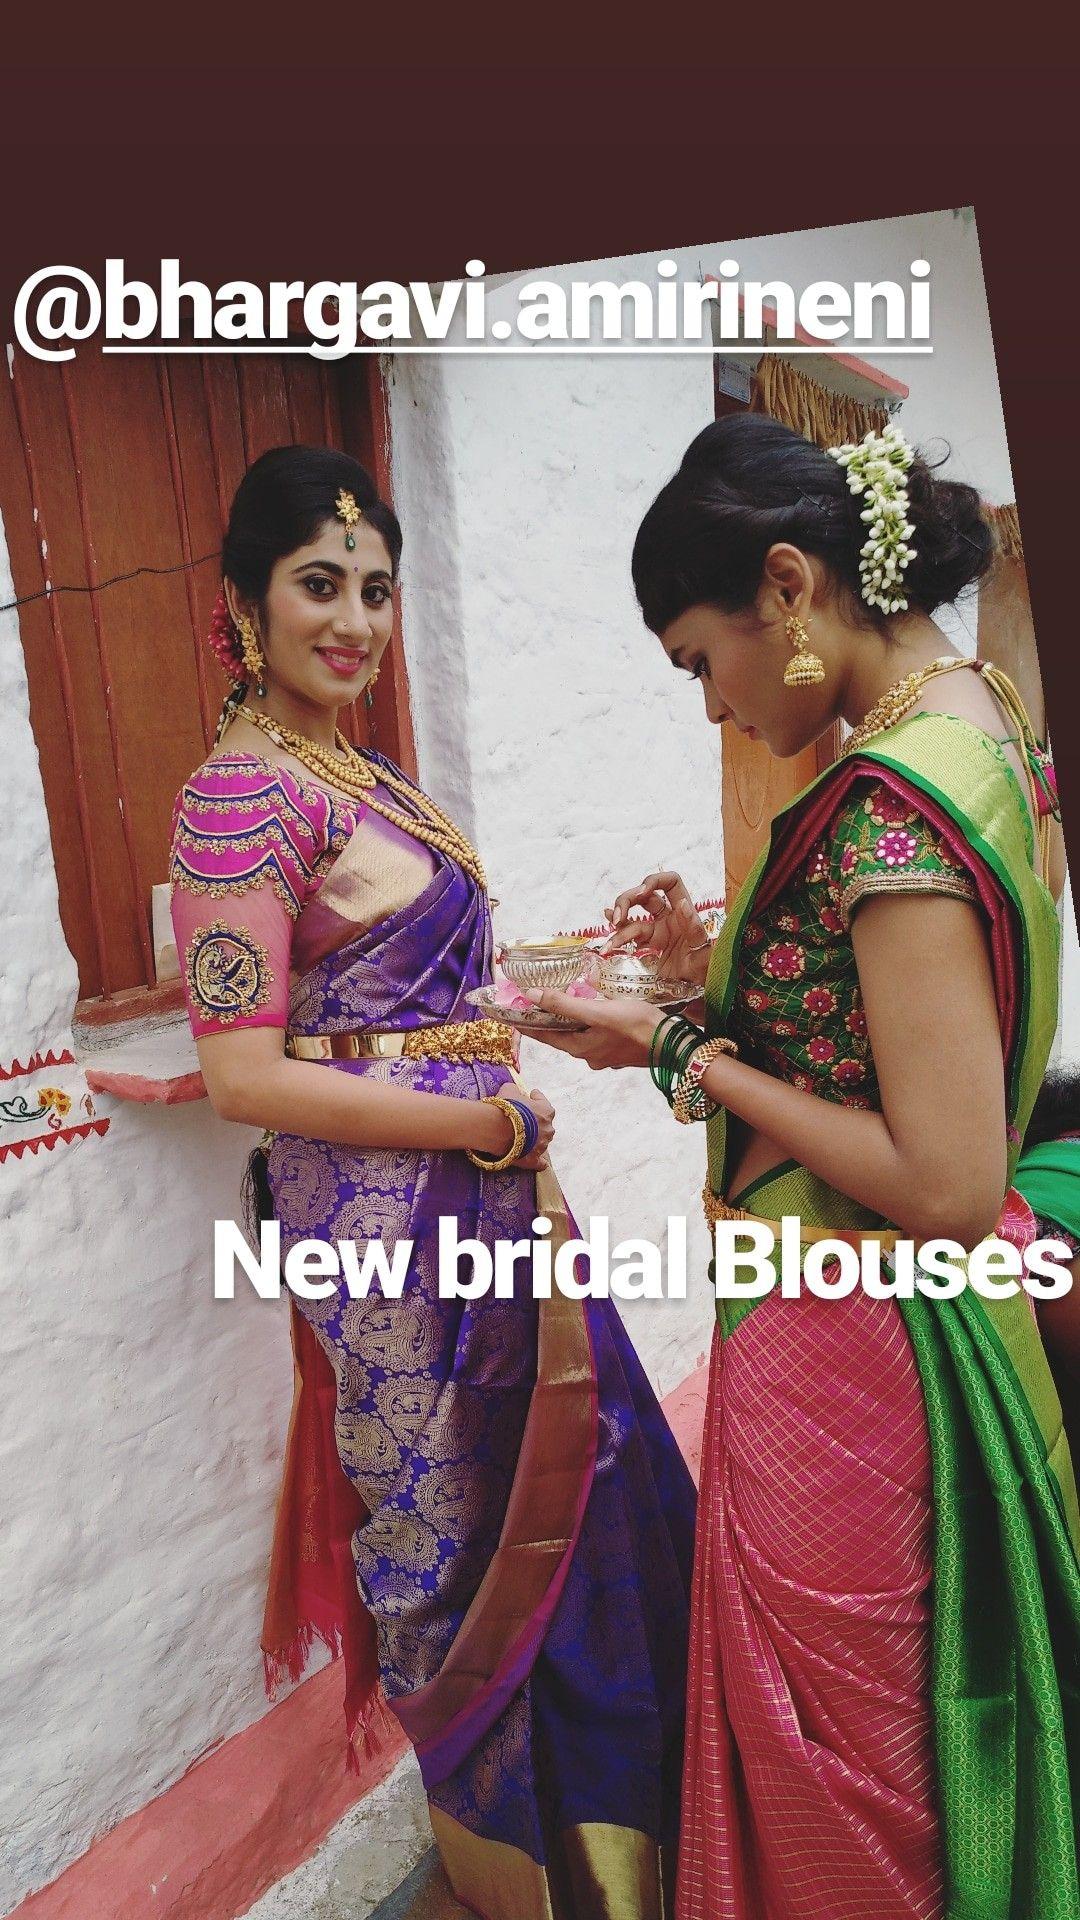 Silk saree blouse designs without embroidery pin by bhargavi amirineni on bhargavi amirineni blouses  pinterest